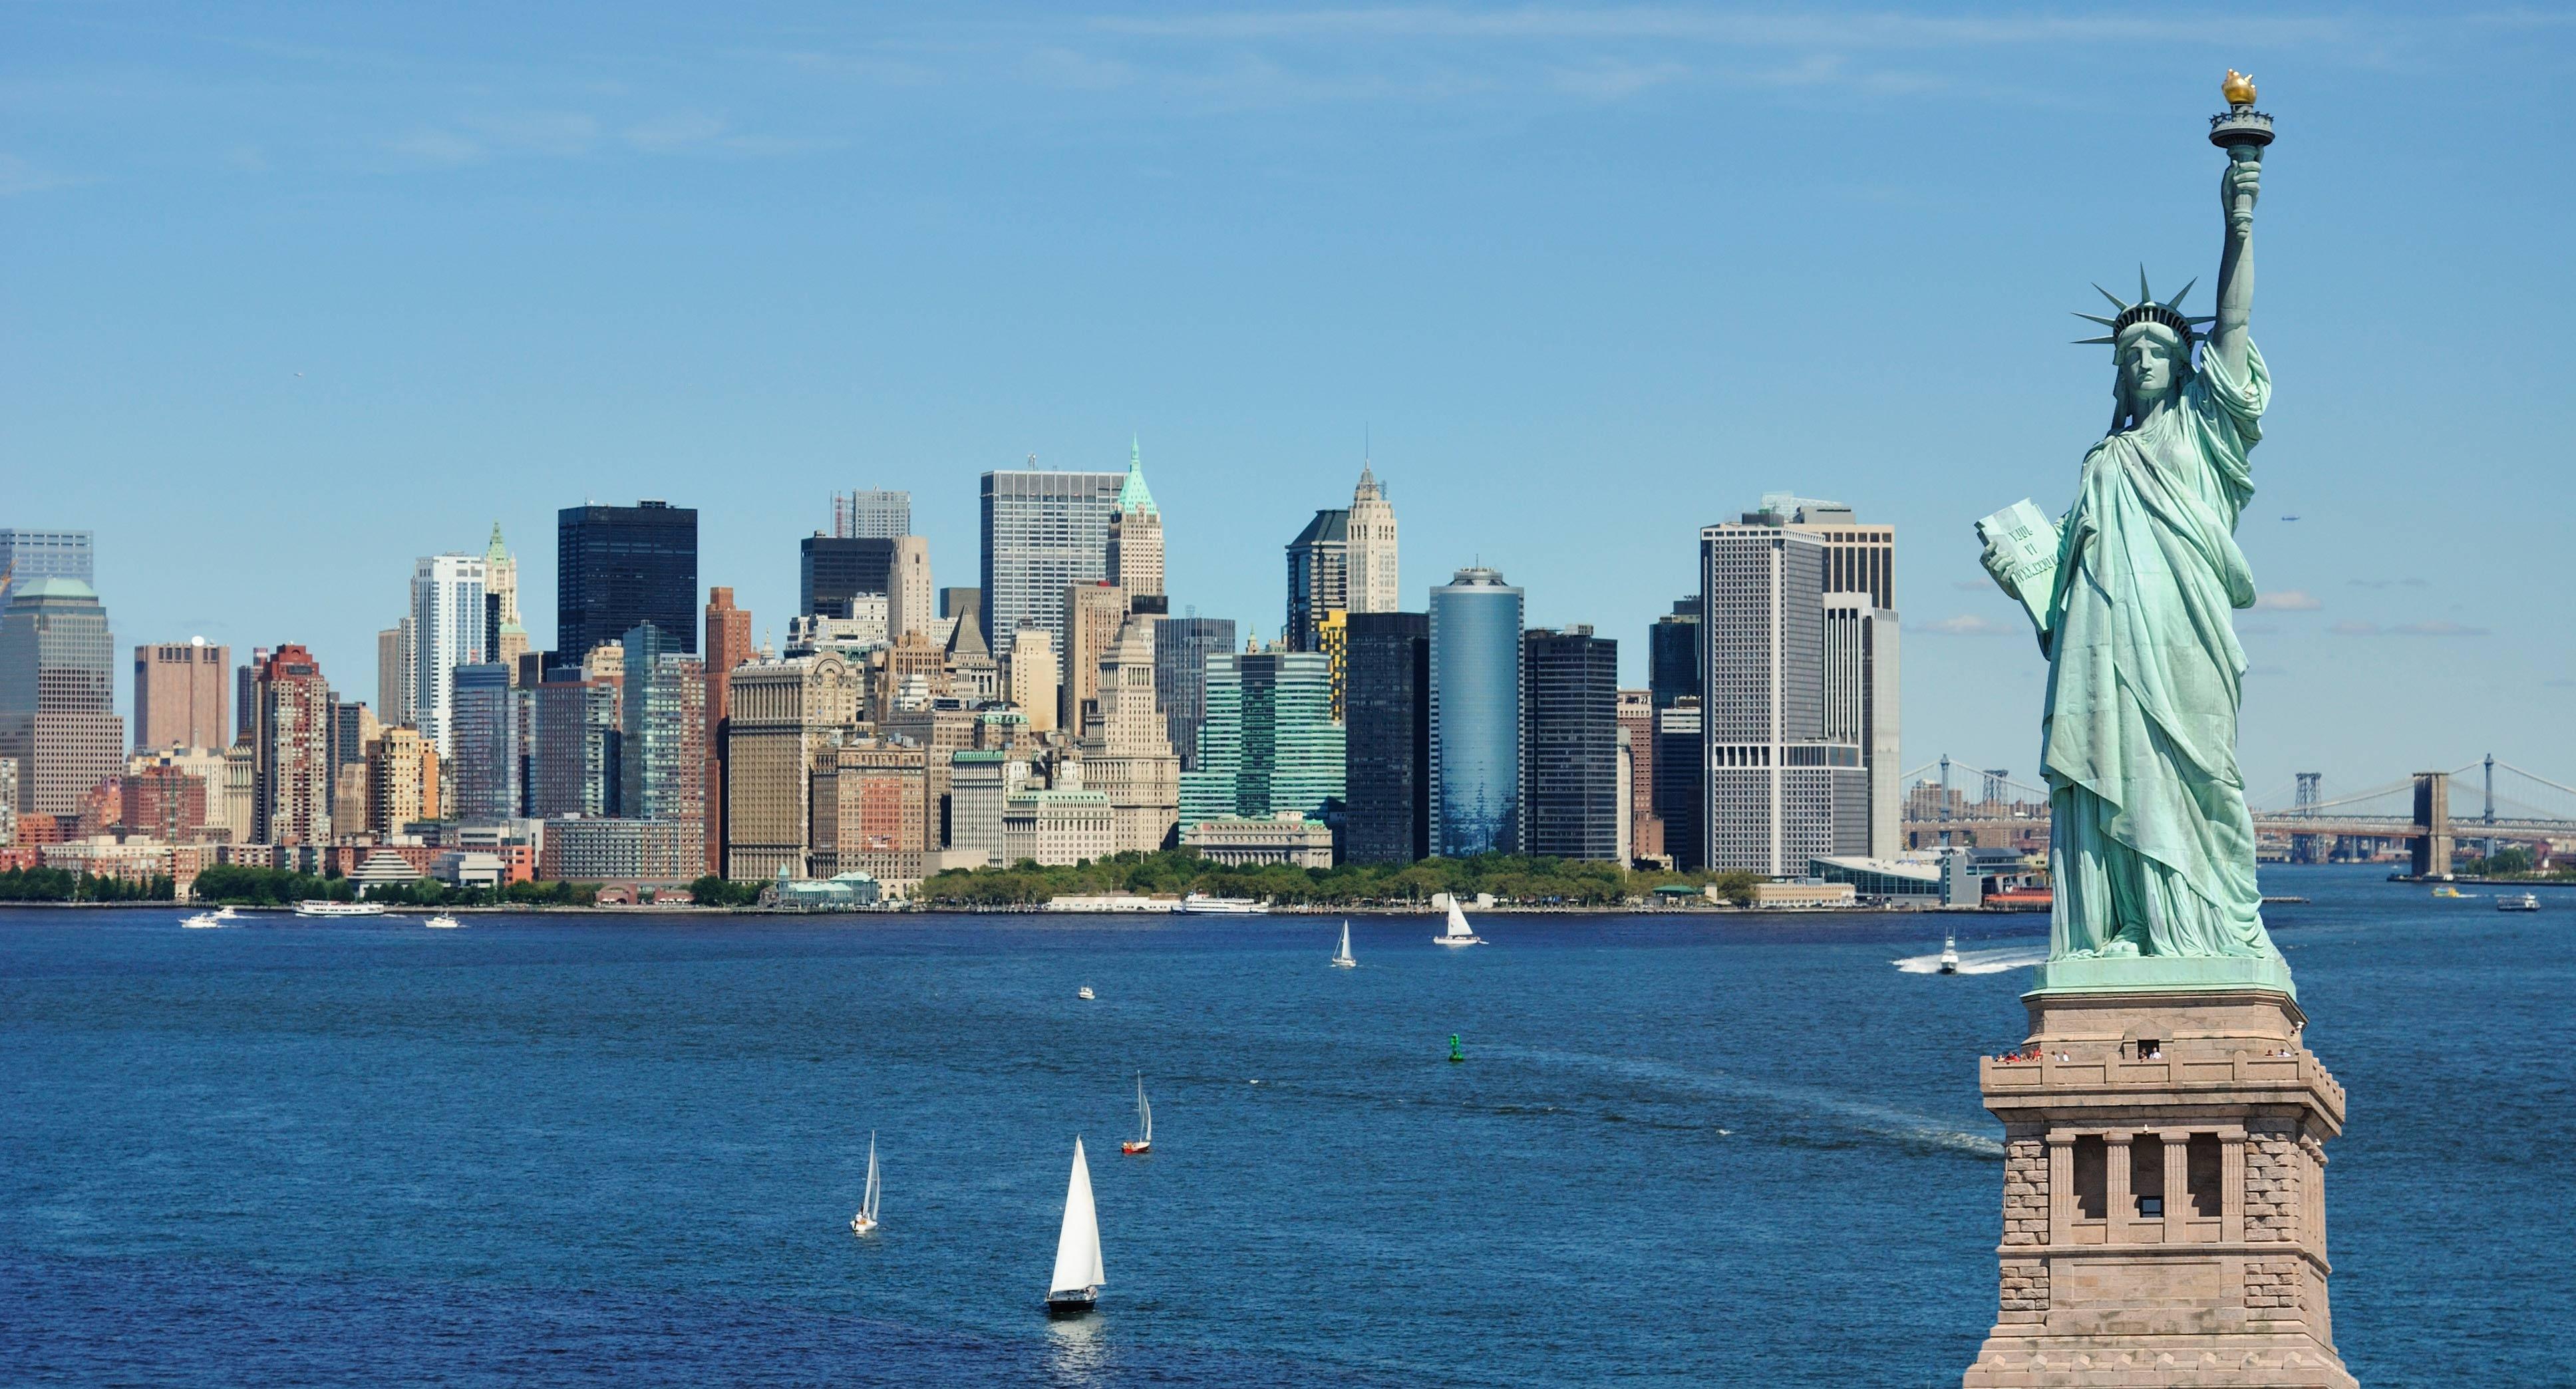 SPECIALE NEW YORK